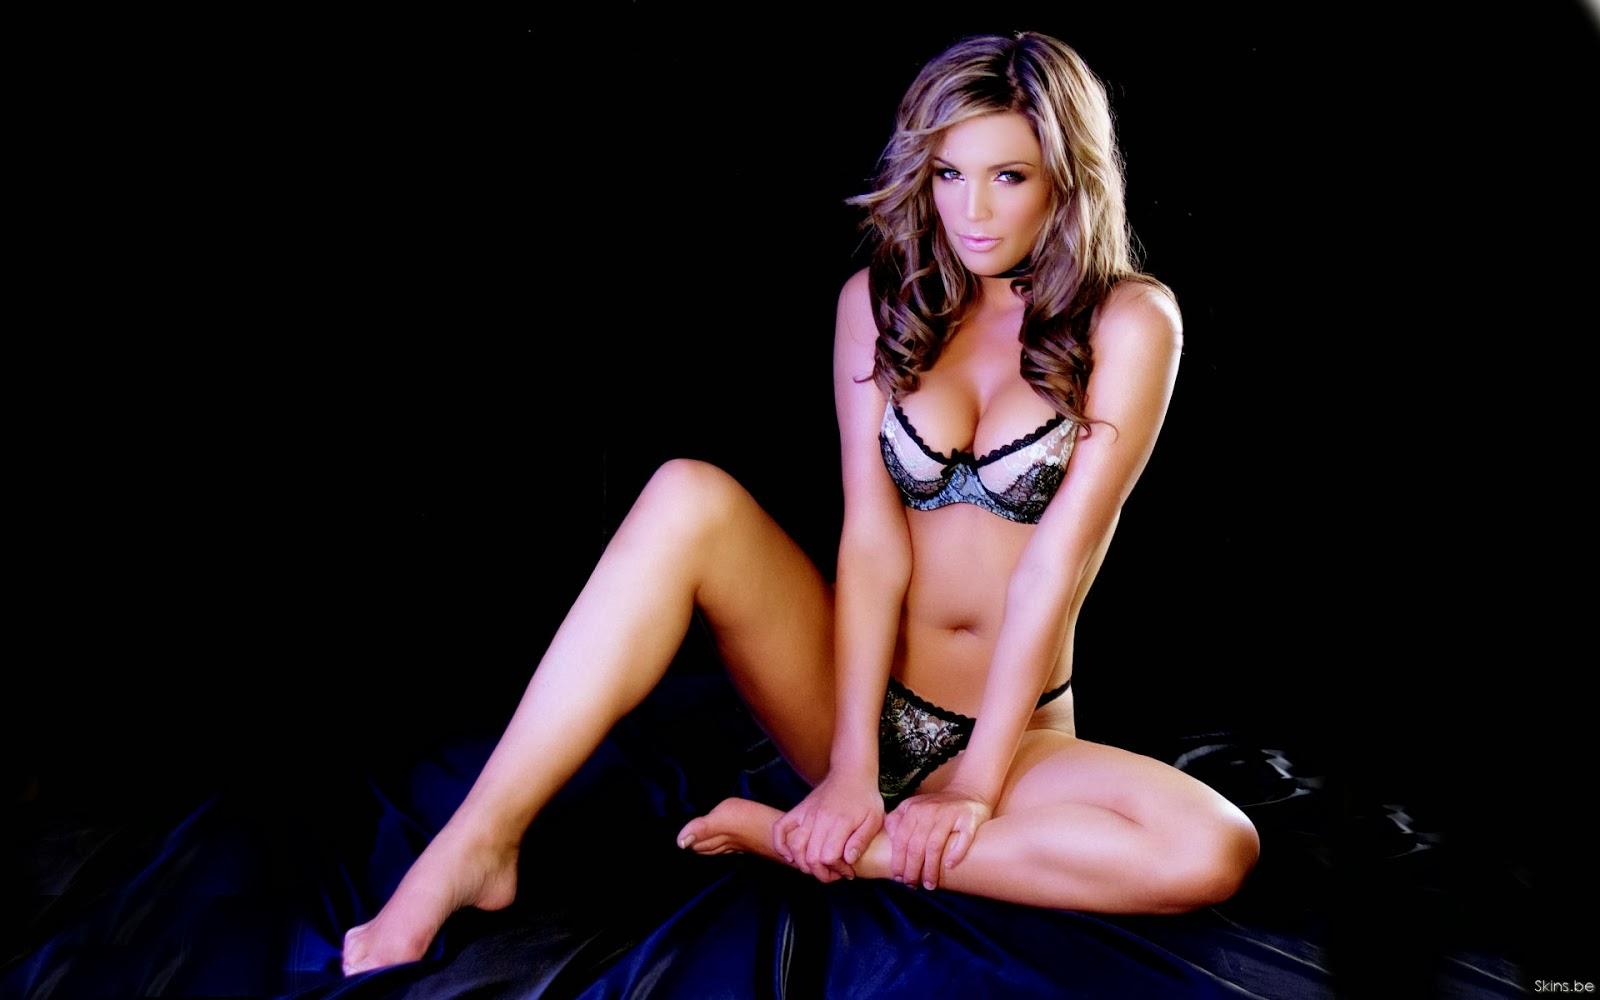 Nude Celebs Images Danielle Lloyd